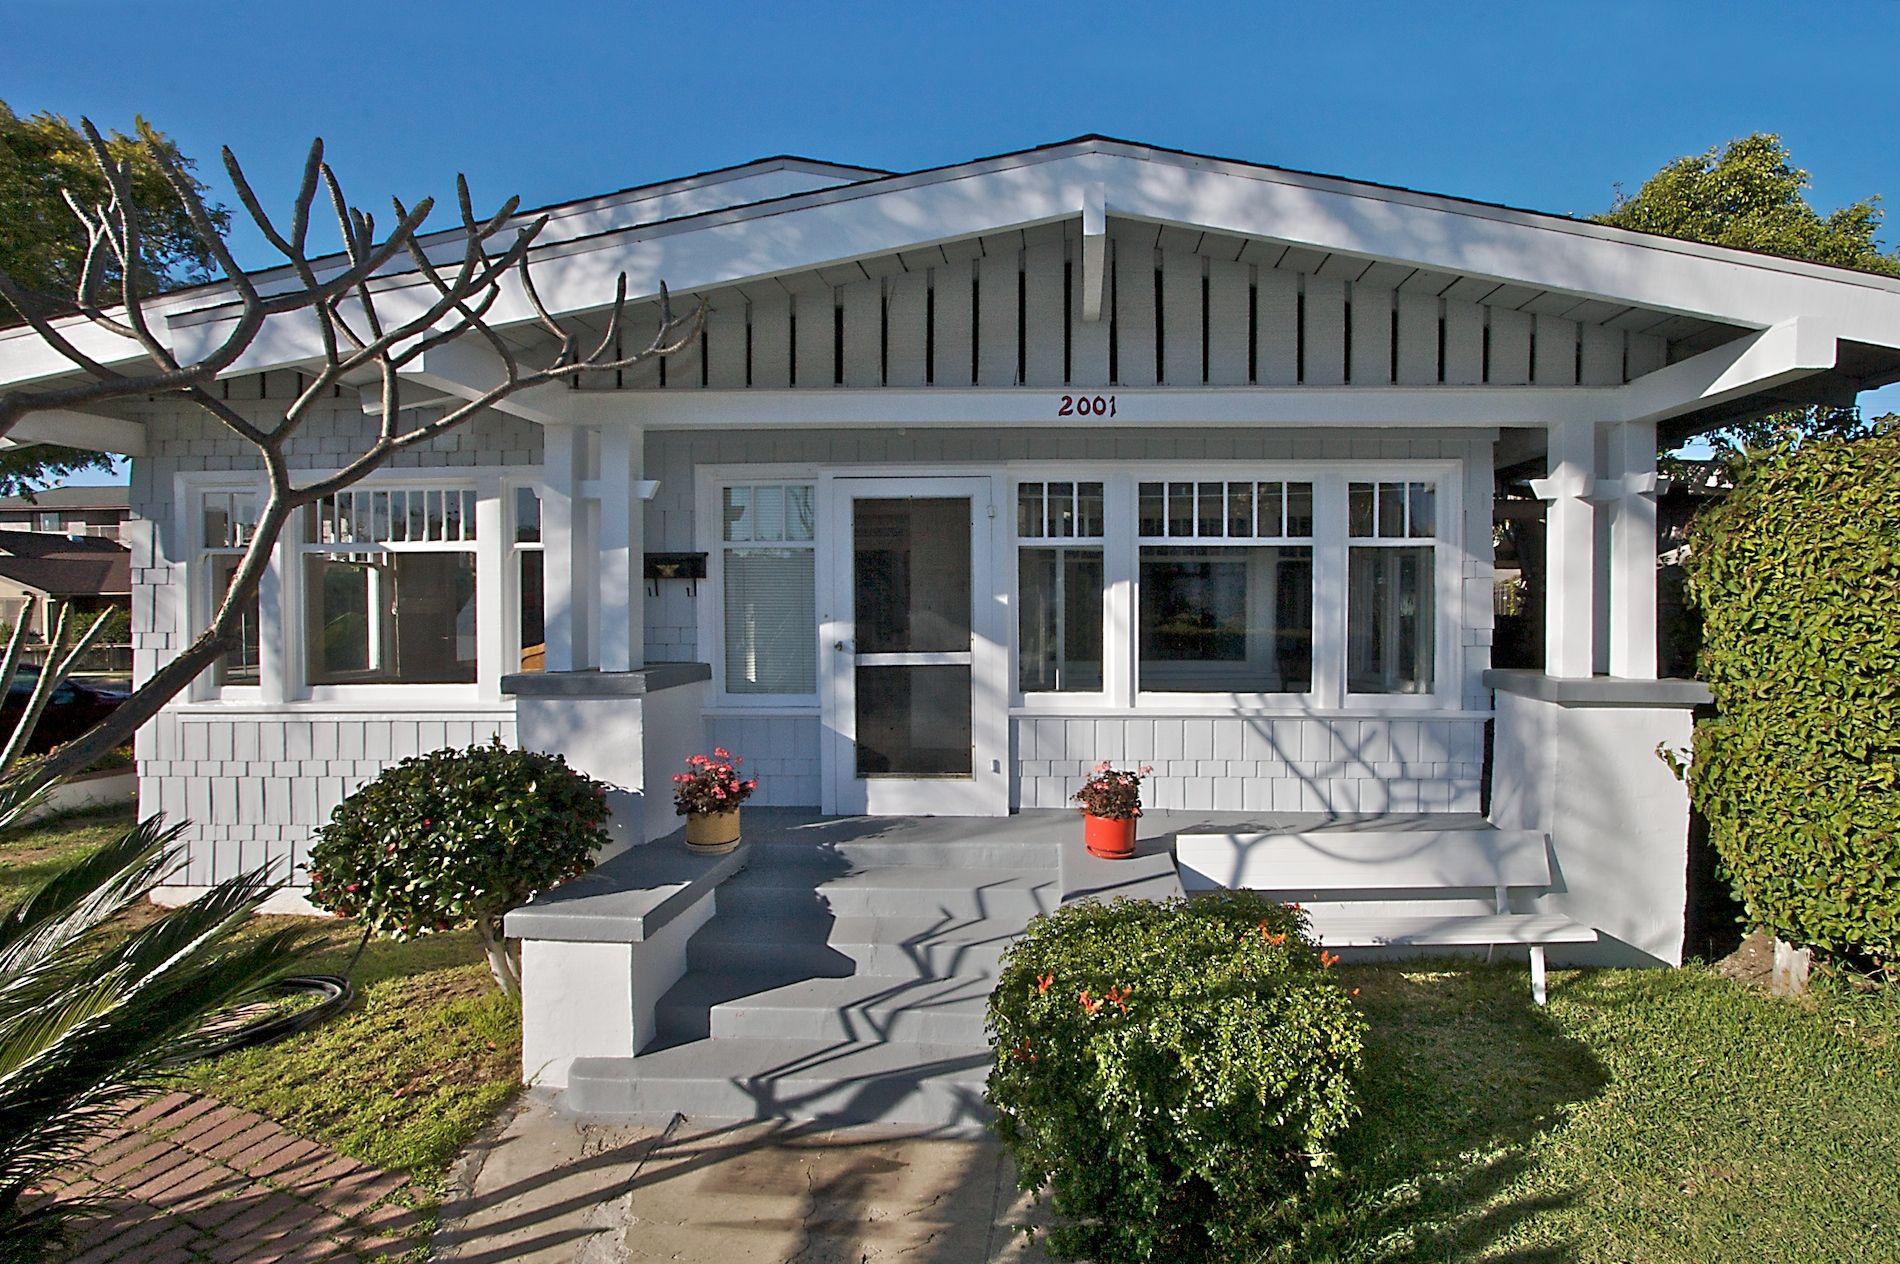 California Bungalow and Craftsman Real Estate | Craftsman ...